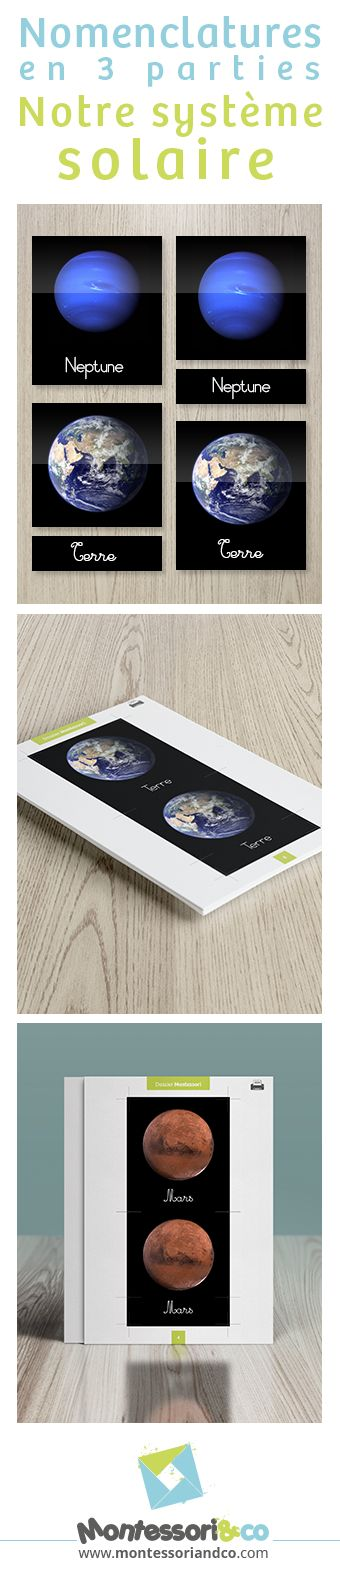 Nos magnifiques cartes de nomenclatures Montessori : notre système solaire. http://montessoriandco.com/documents-montessori/ecriture/le-2eme-alphabet-mobile-montessori/